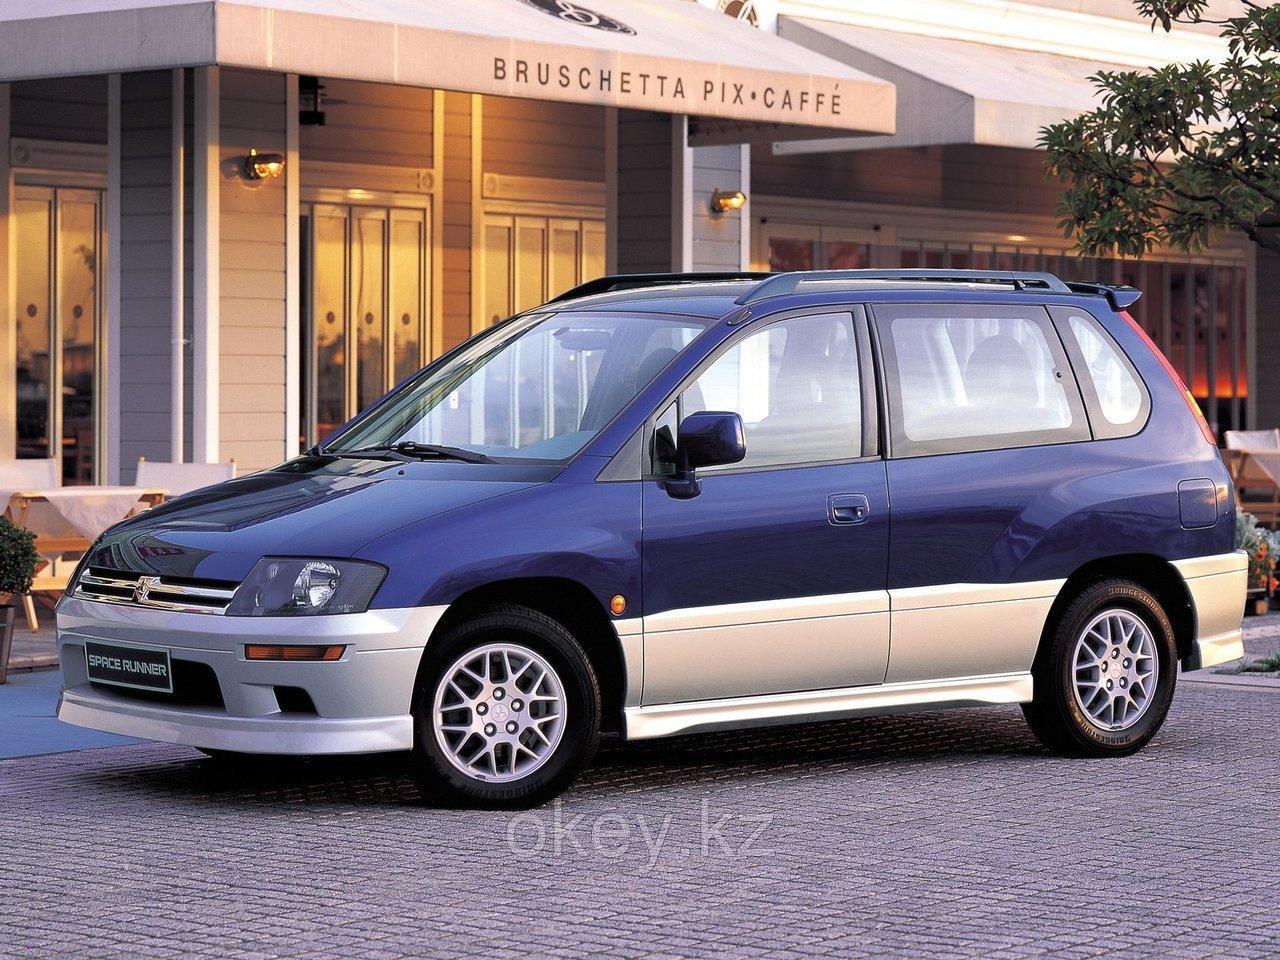 Тормозные колодки Kötl 3200KT для Mitsubishi Space Runner II/RVR II (N6_W, N7_W) 2.4 GDi 4WD, 1999-2003 года выпуска.